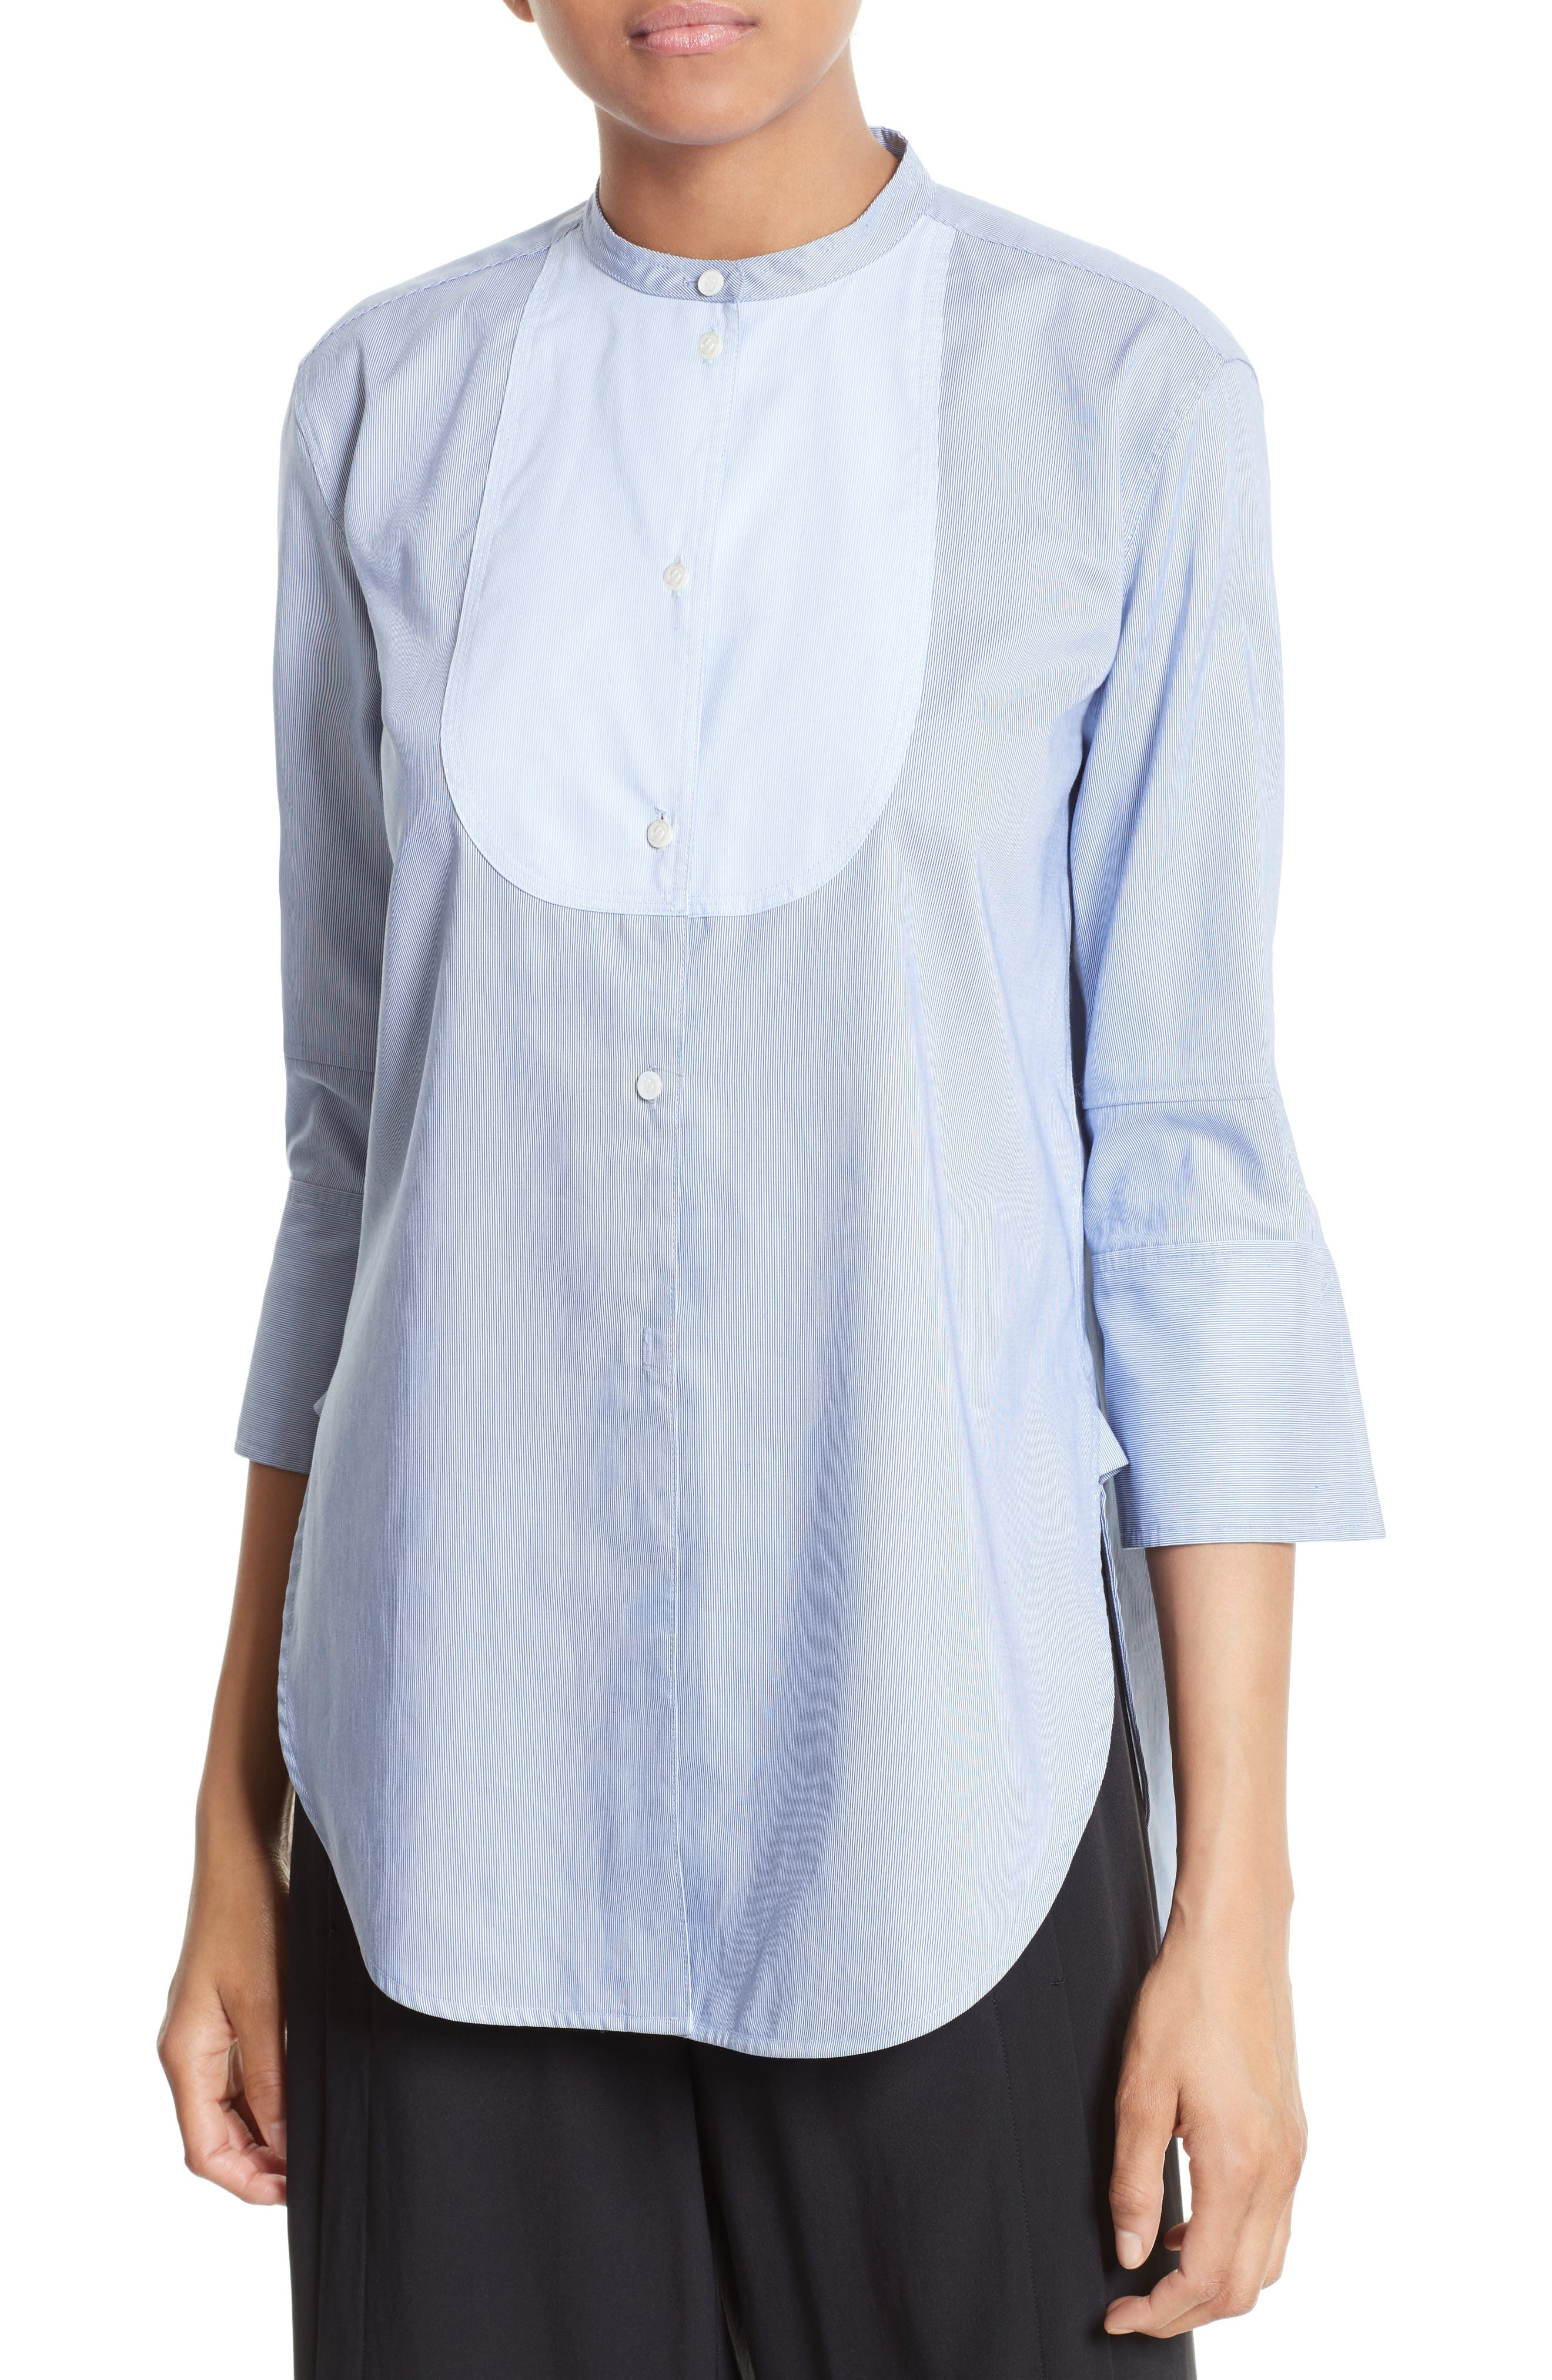 Alternate Image 1 Selected - Helmut Lang Ottoman Tuxedo Shirt